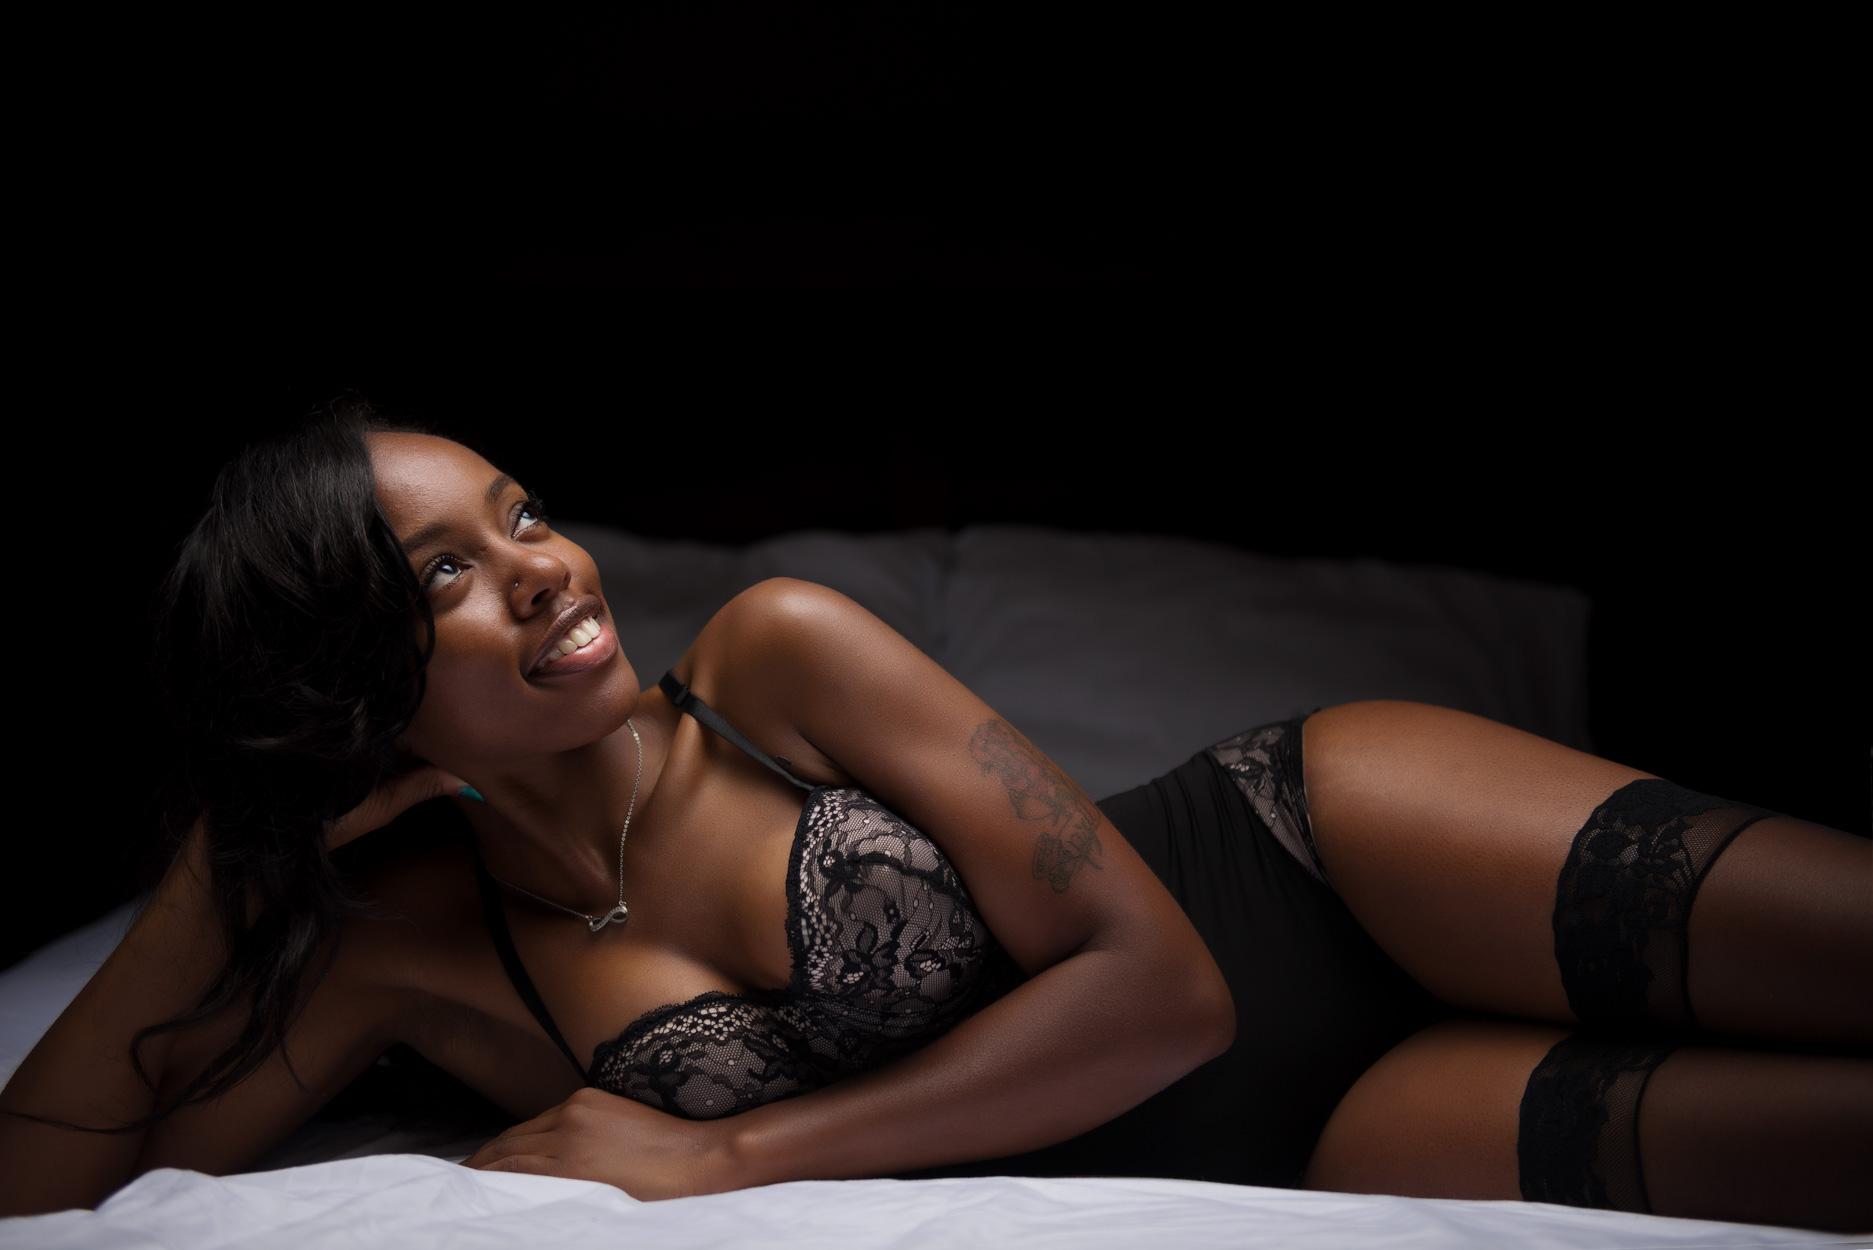 boudoir Photography by Sean